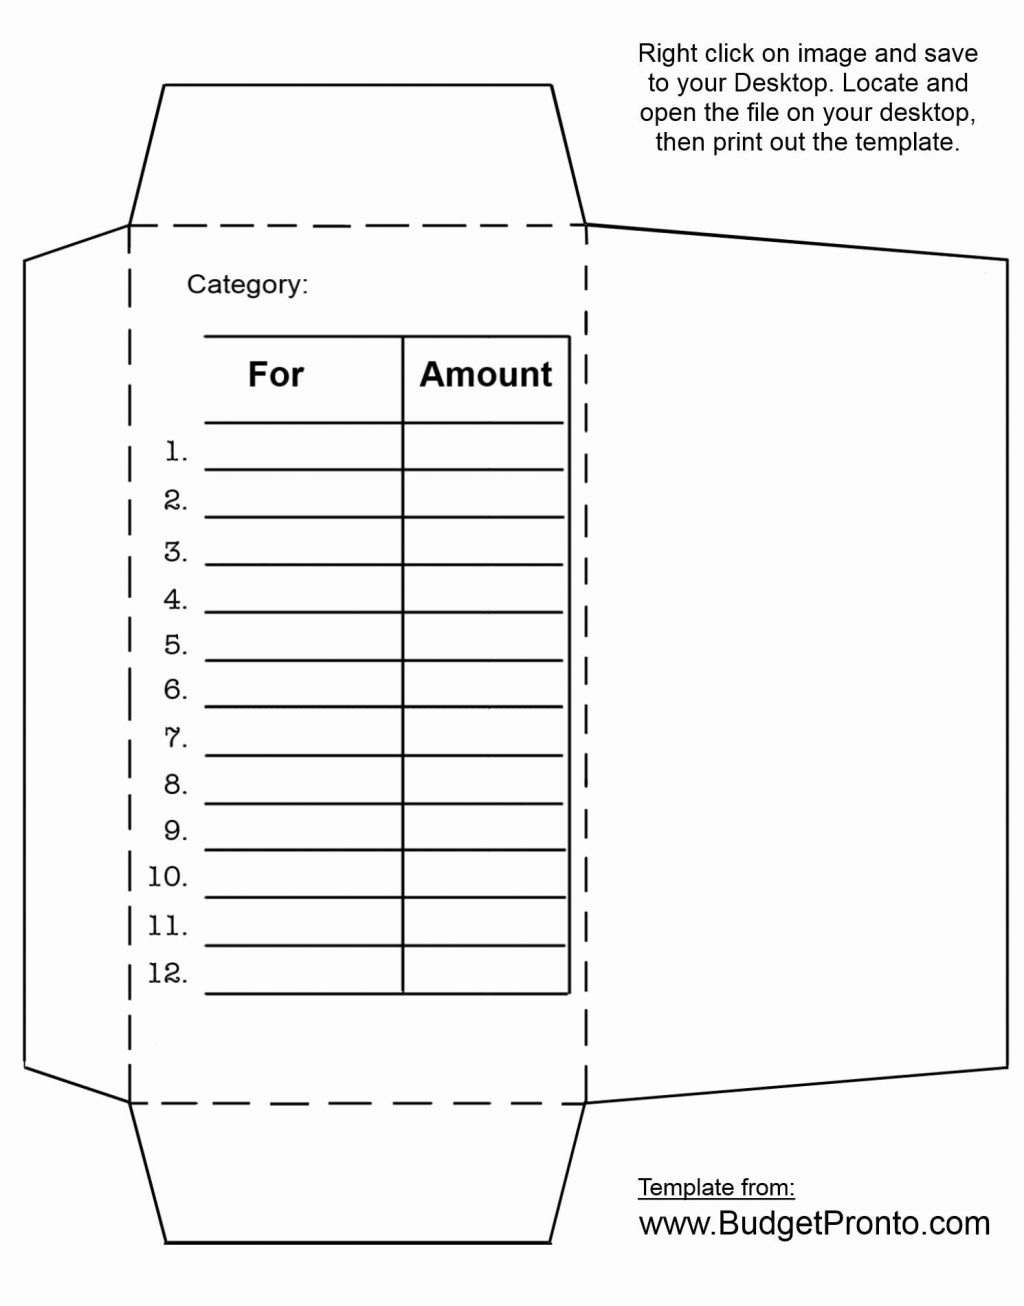 Envelope Budget Spreadsheet Throughout Example Of Envelope Budget Spreadsheet Excel Dave Ramsey Elegant Bud